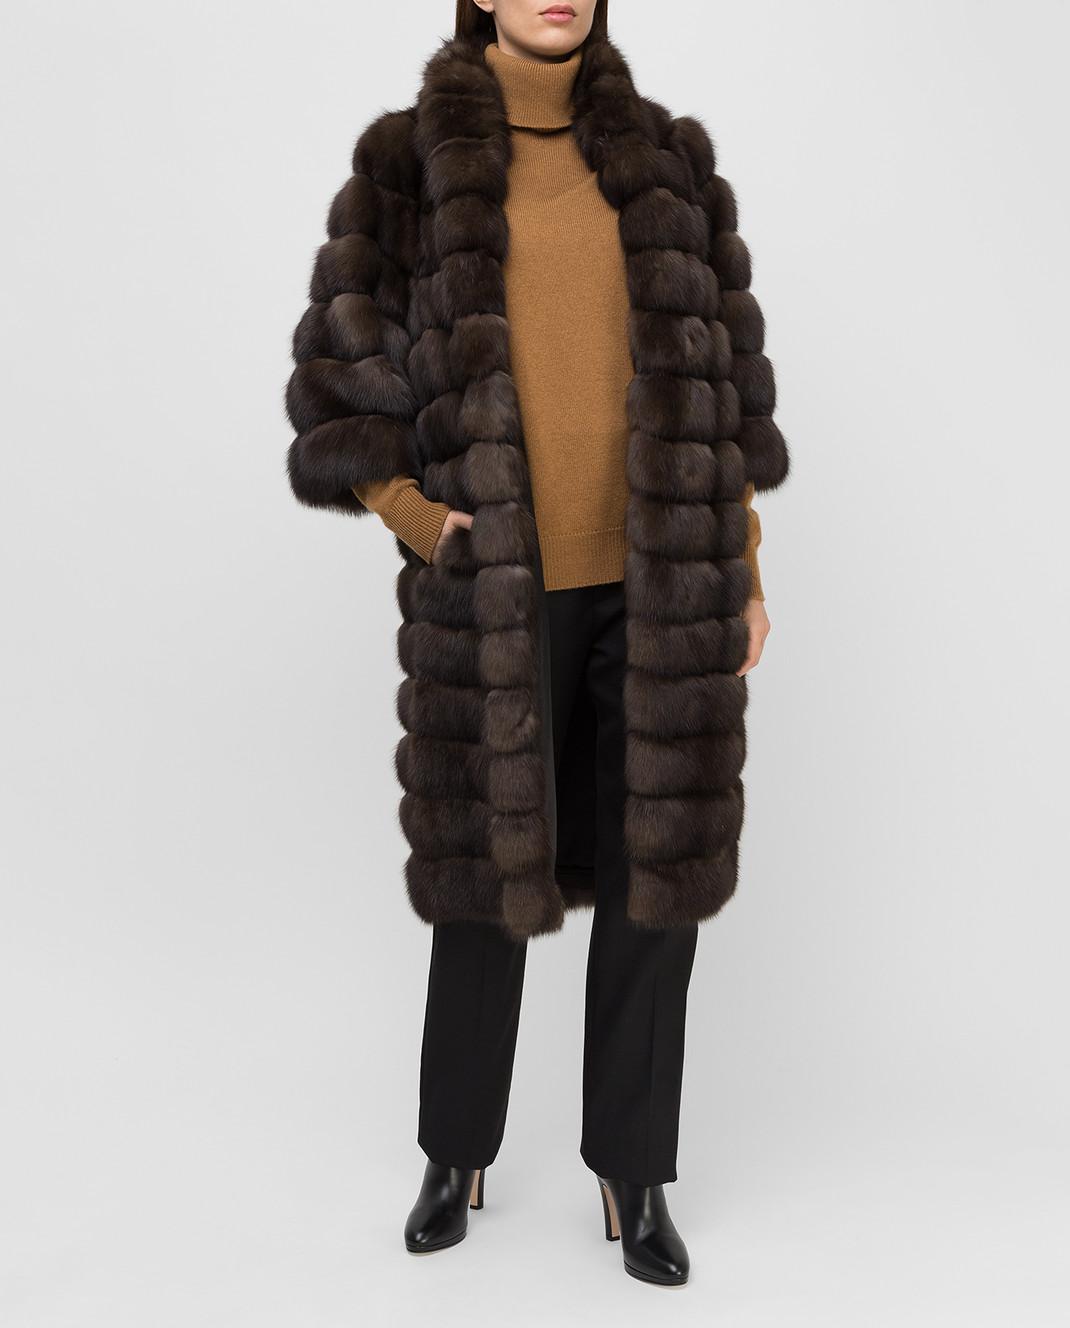 Real Furs House Темно-коричневая шуба из соболя 24342SILVERY изображение 2